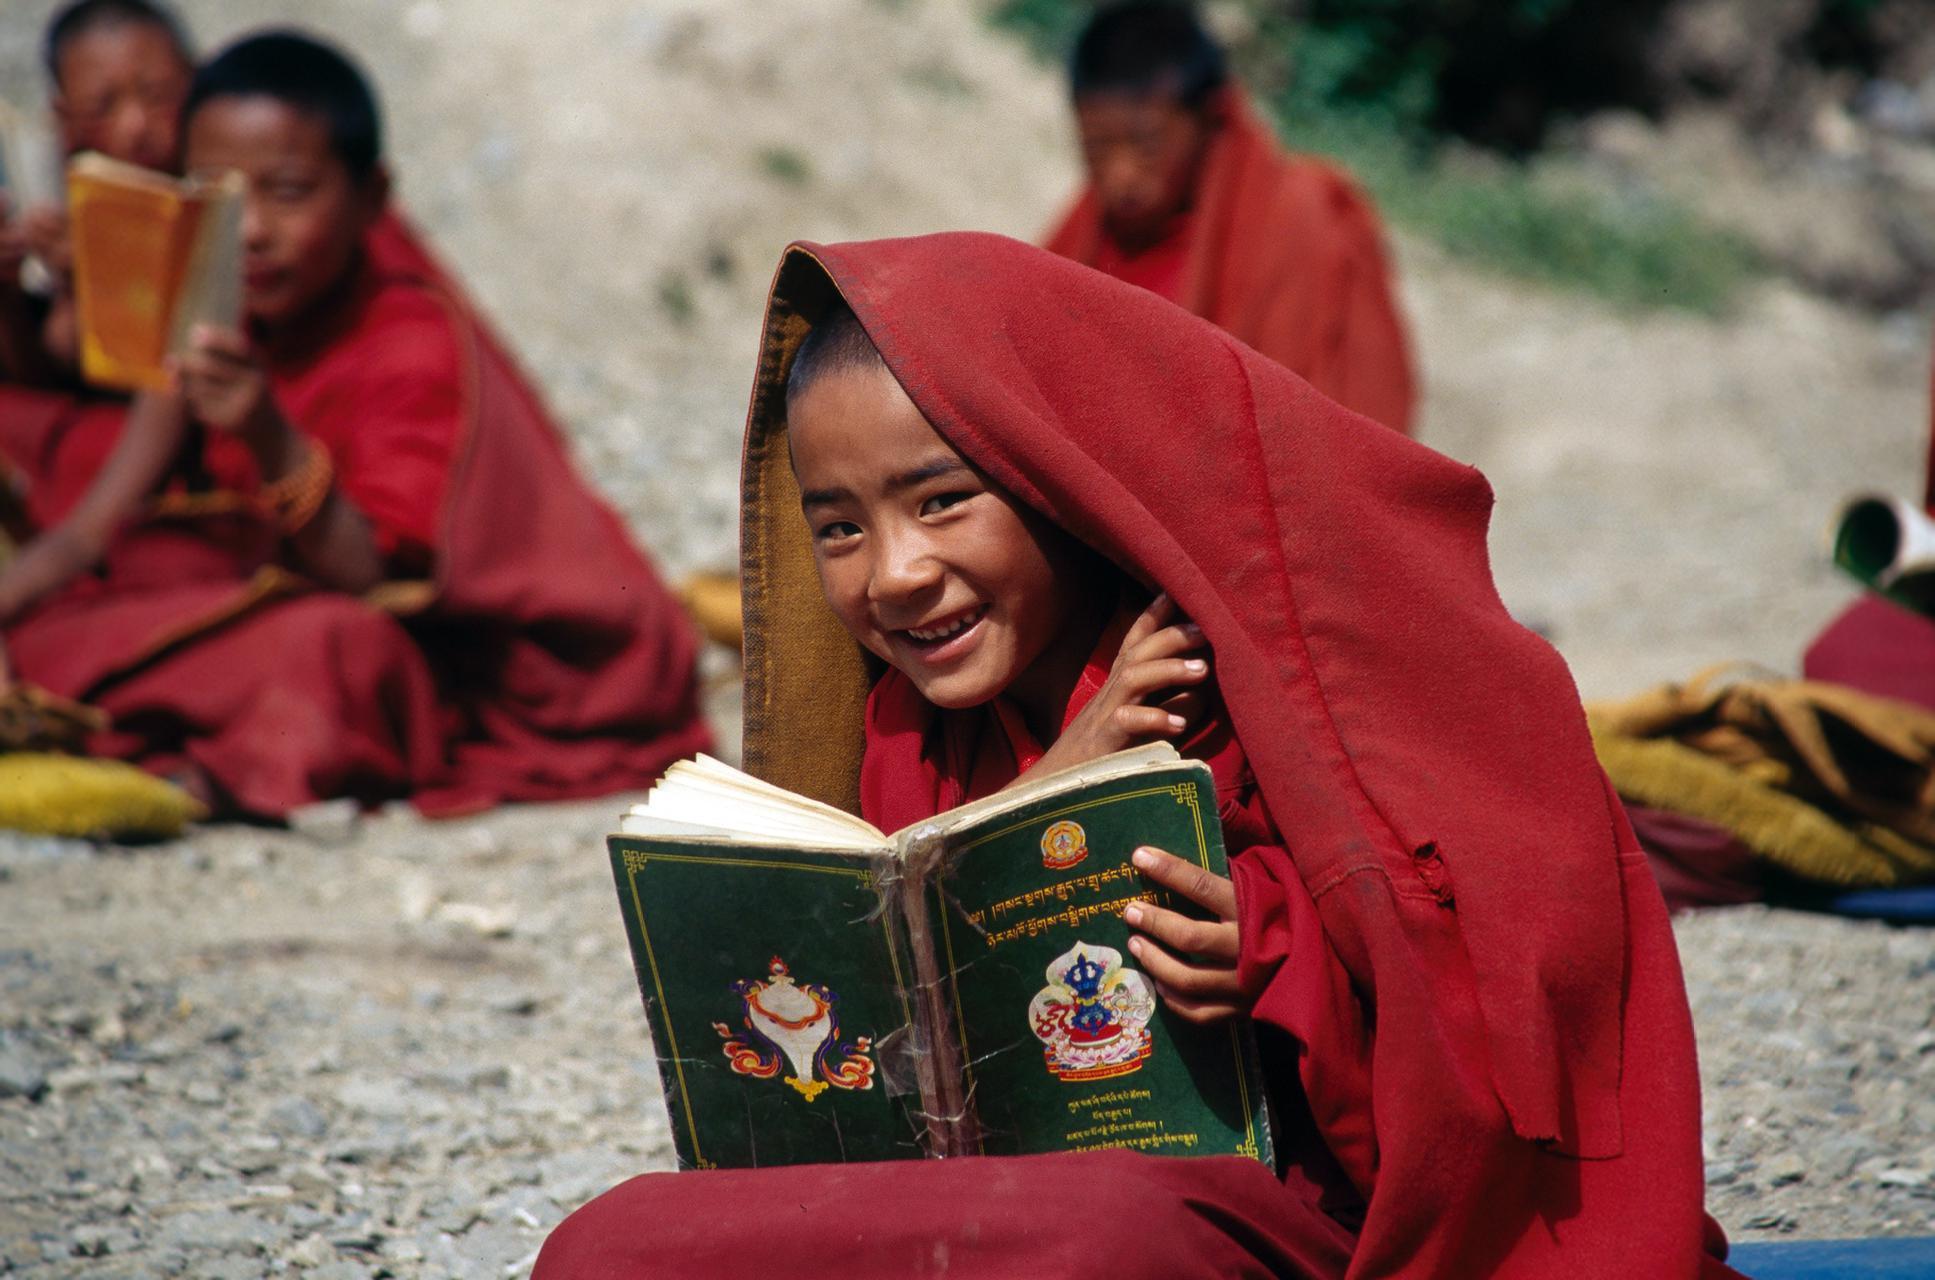 Photo: a boy Tibetan monk, reading a book with Tibetan letters